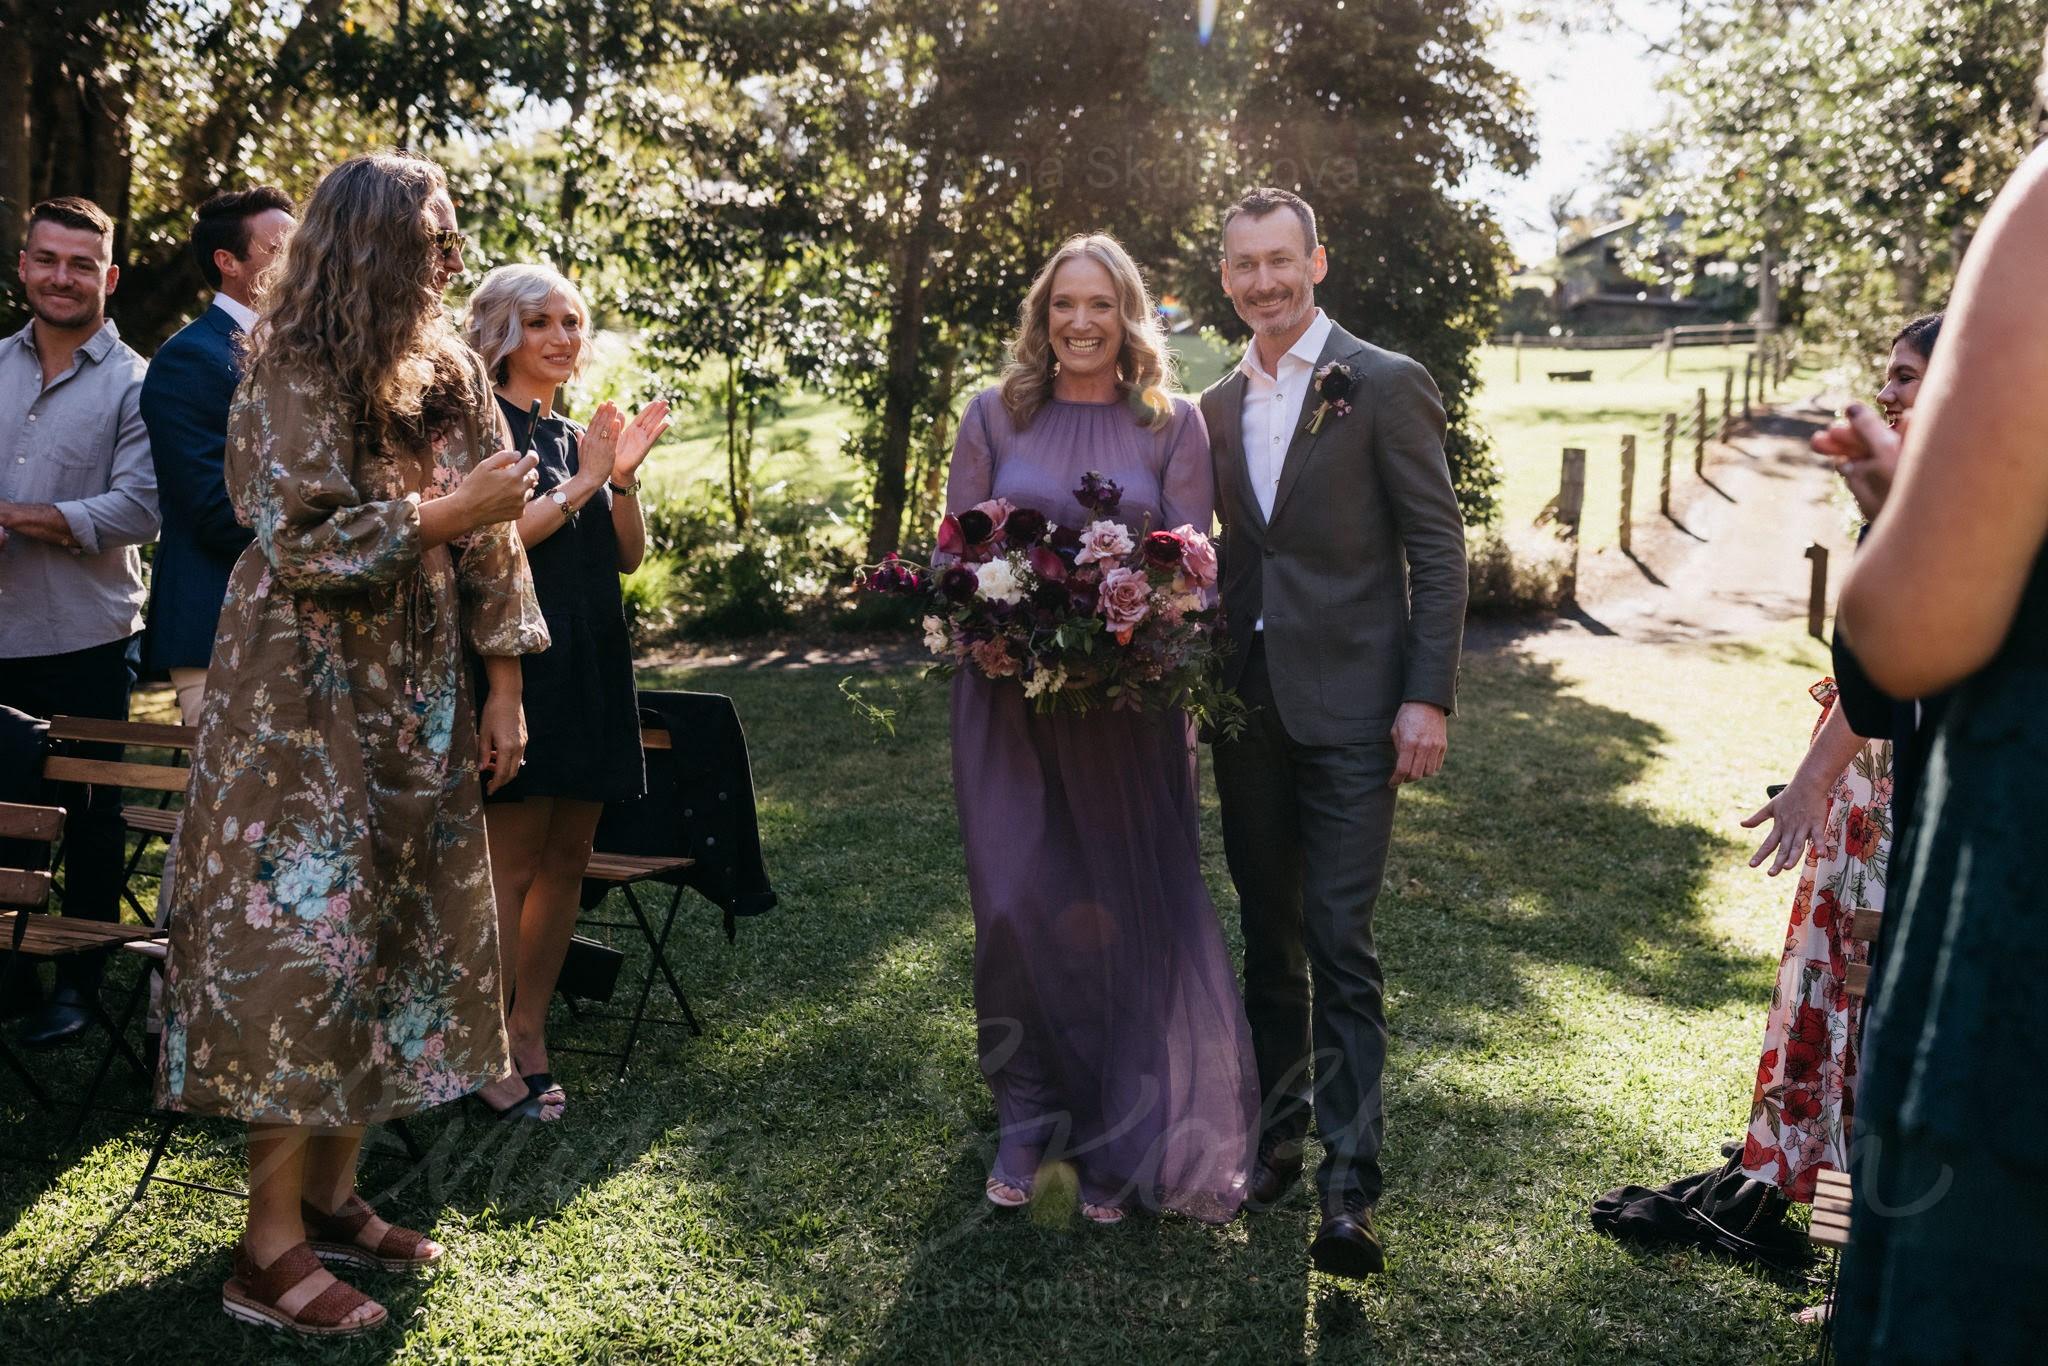 Violet wedding dress in vintage style  0127   Photo 2